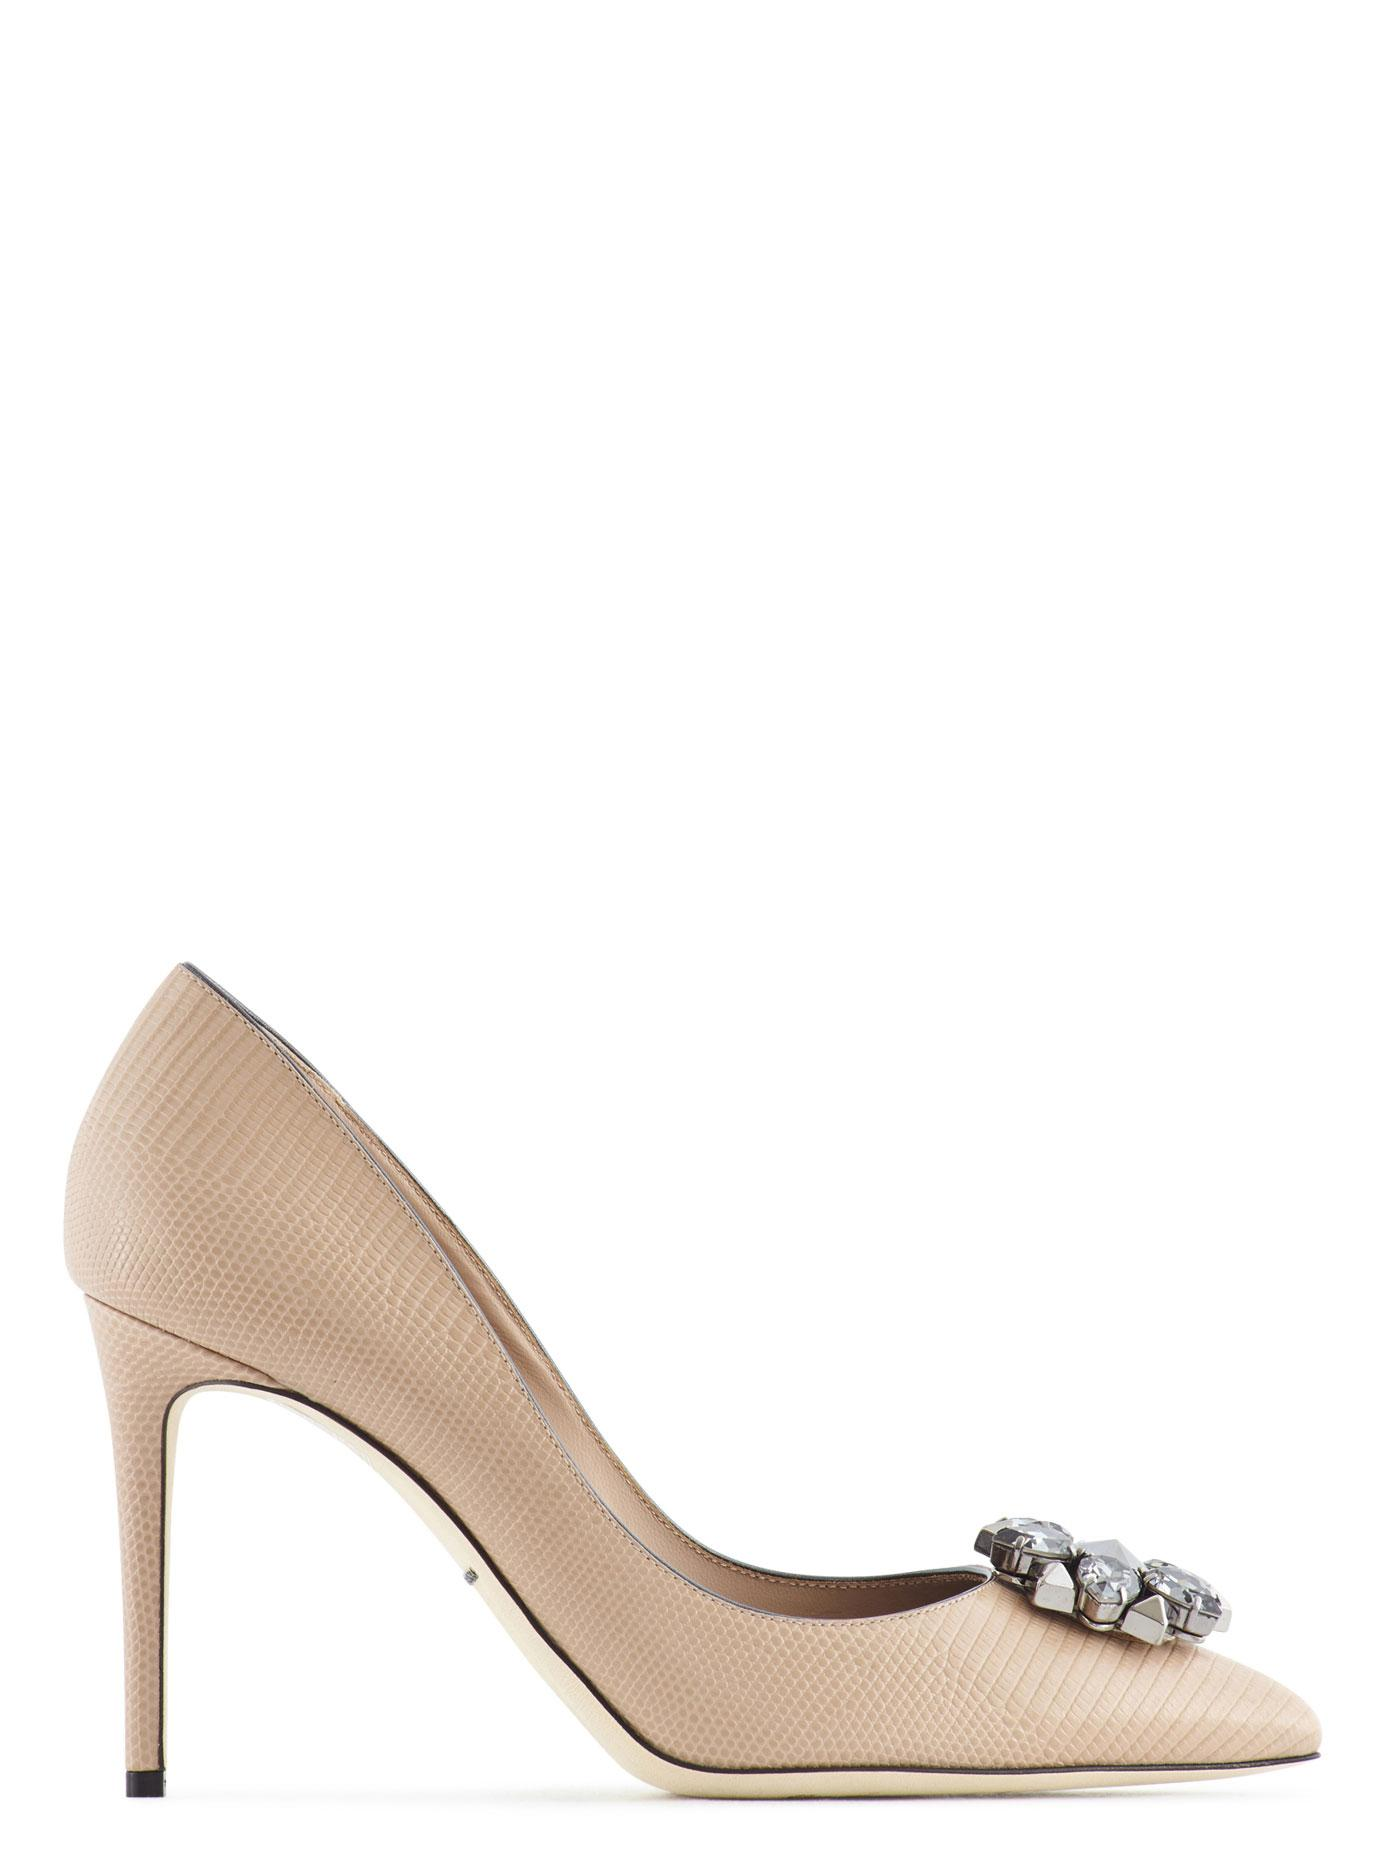 Dolce & Gabbana Velvet Bow-Adorned Pumps cheap new arrival t1Ee1F6dO7